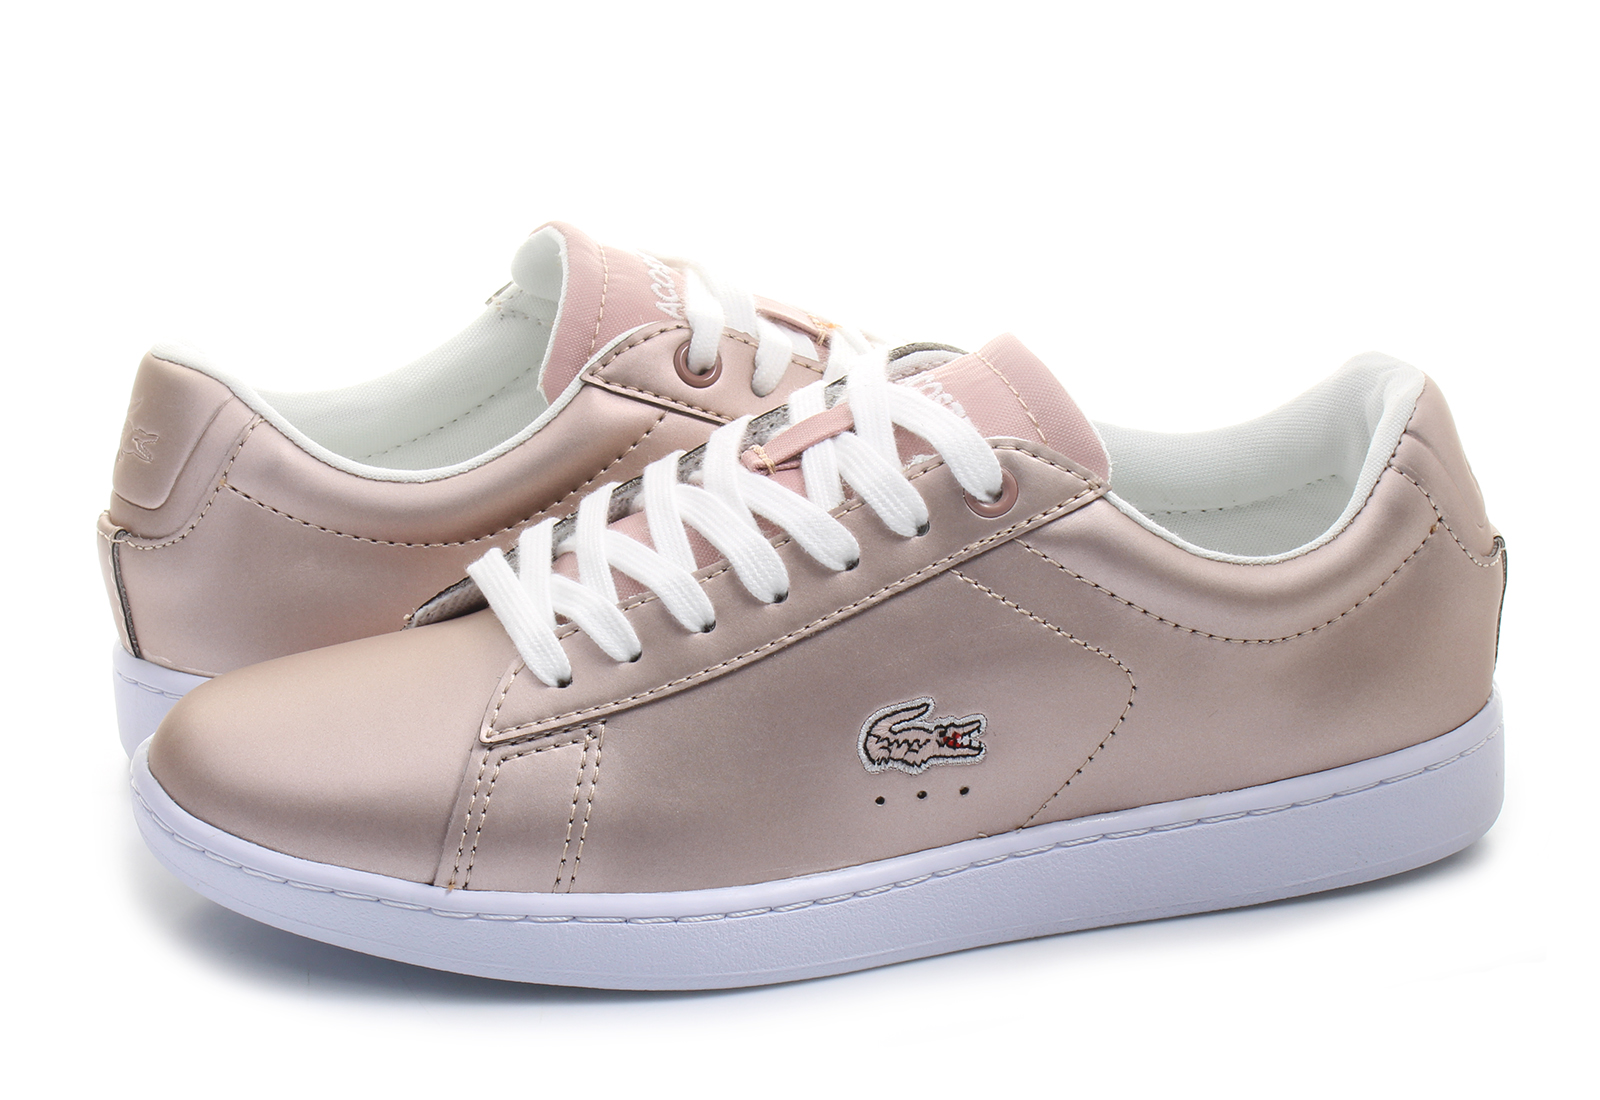 Lacoste Cipő - carnaby - 171spw1012-15j - Office Shoes Magyarország 37f5596acb